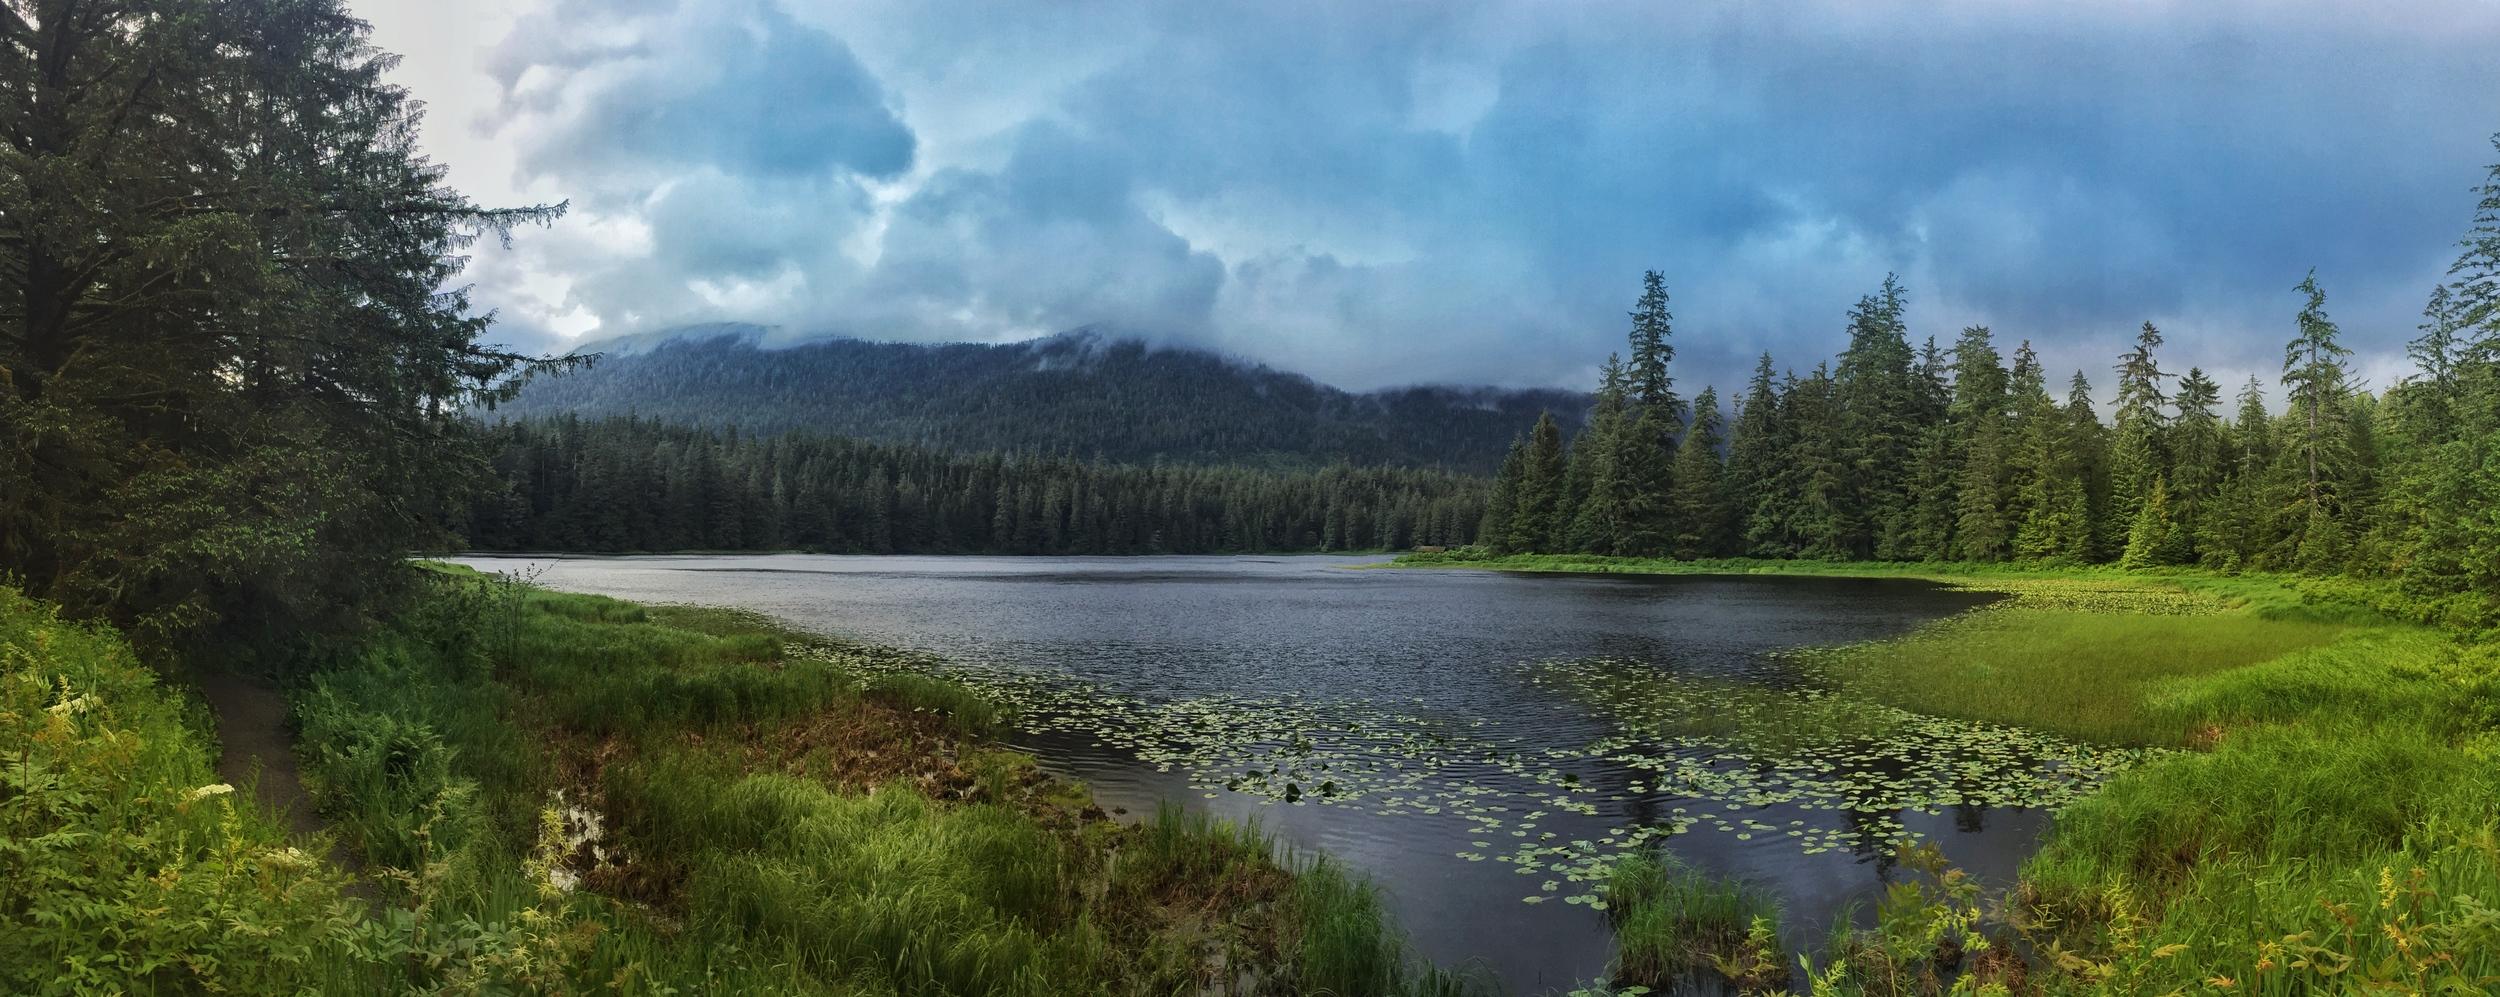 Ward Lake shot with my Iphone 6